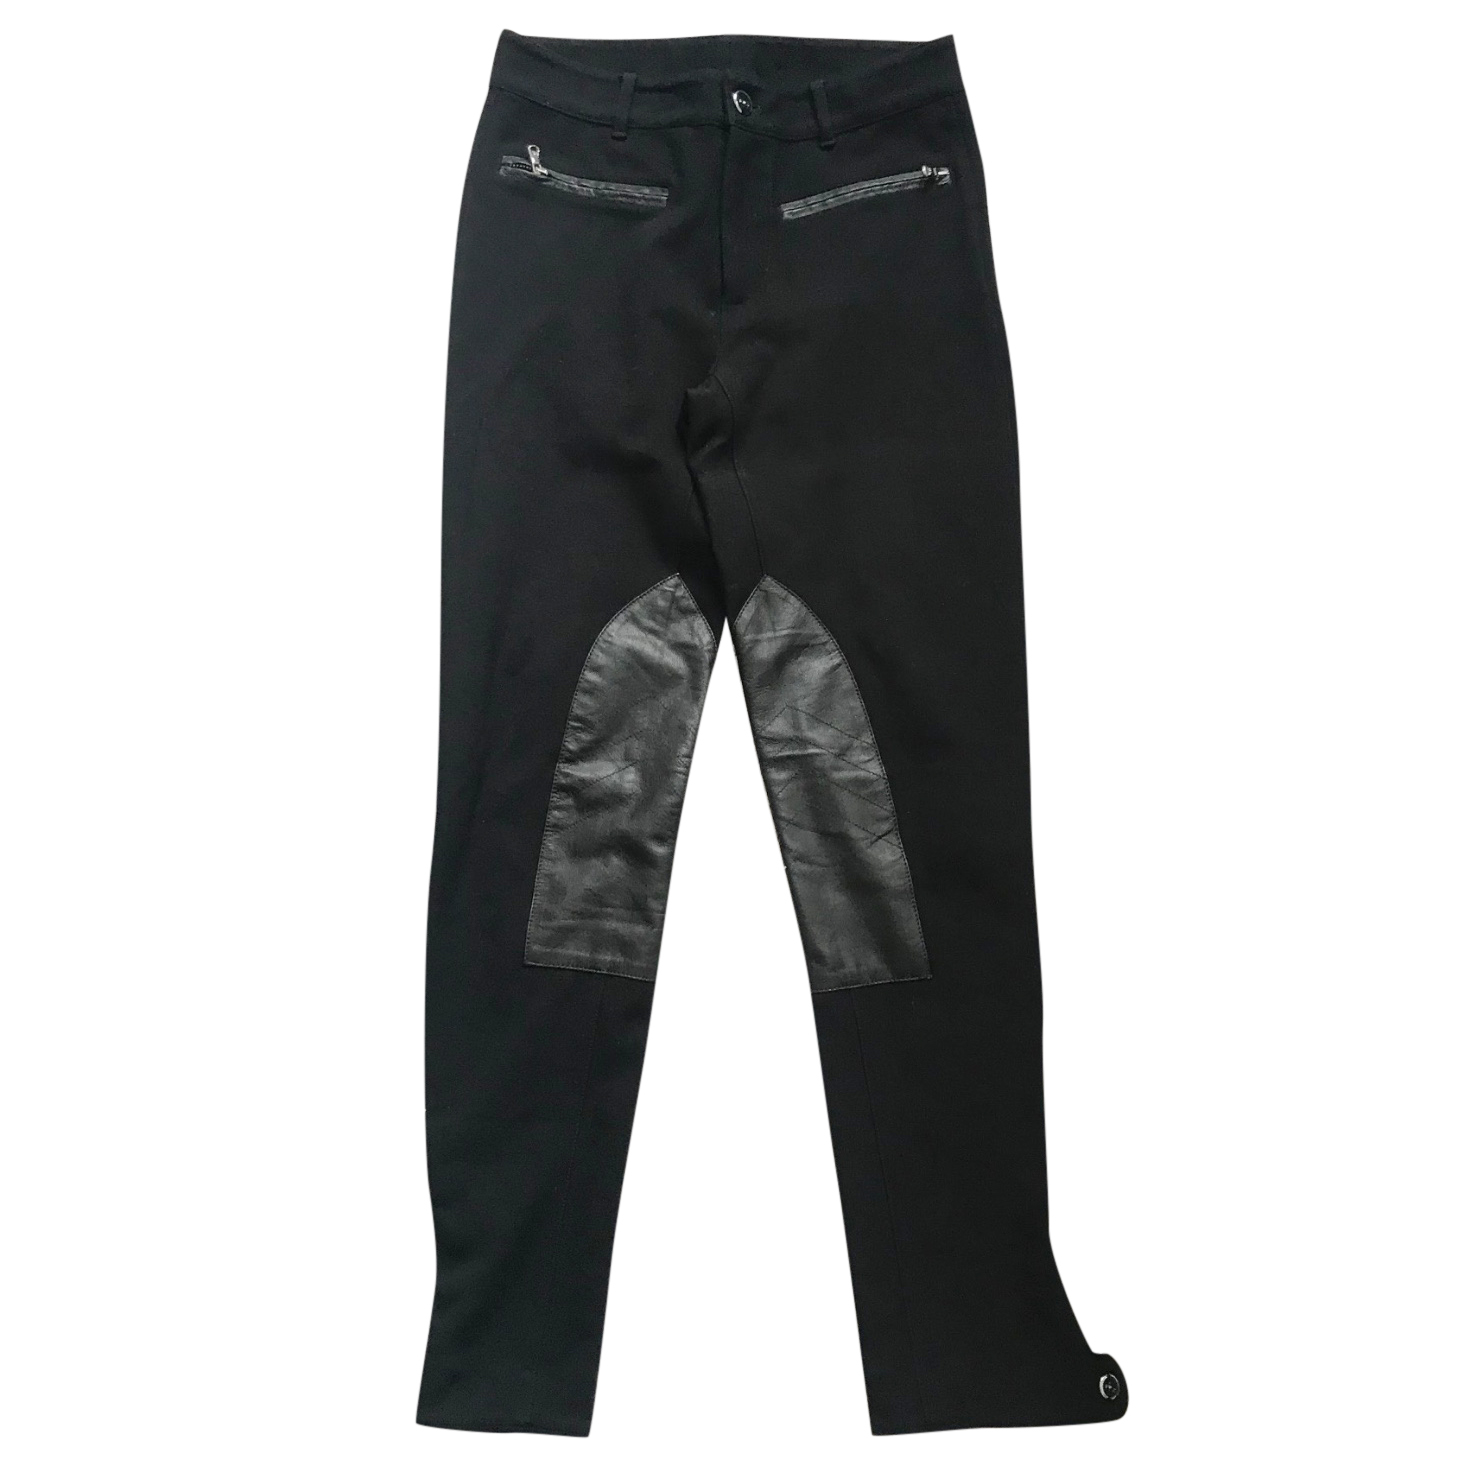 RALPH LAUREN Black Stretch Pants with leather details